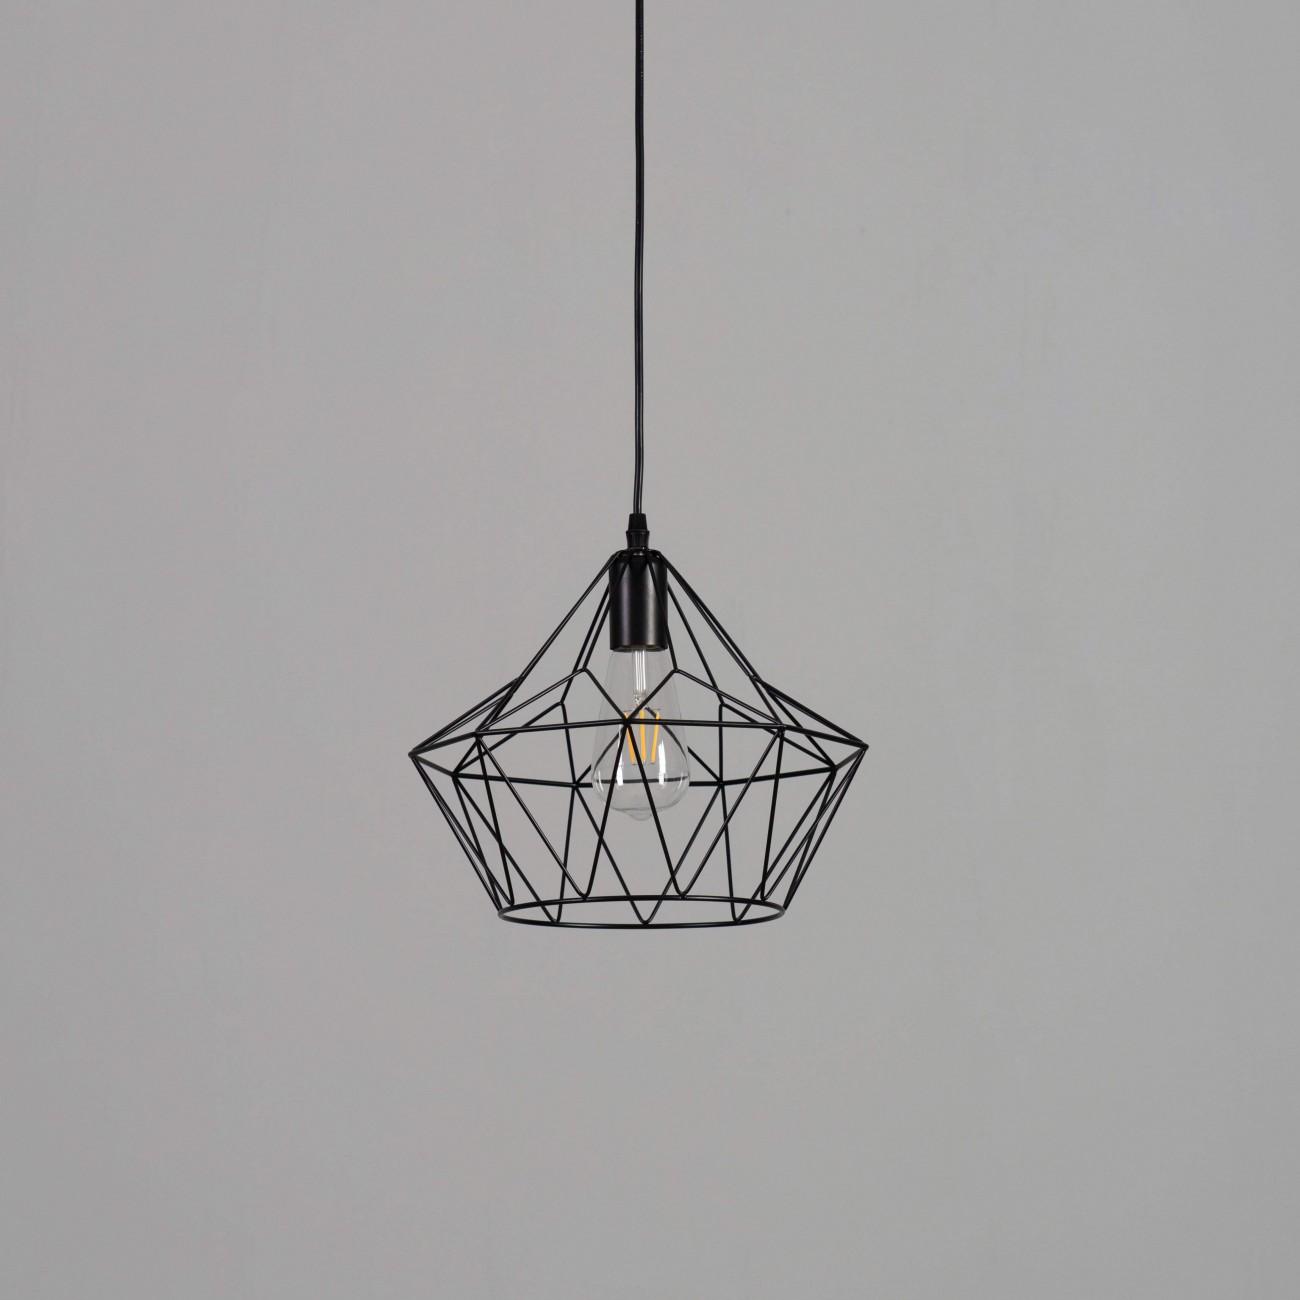 Industrial Pendant Light Metal Black Cage E27